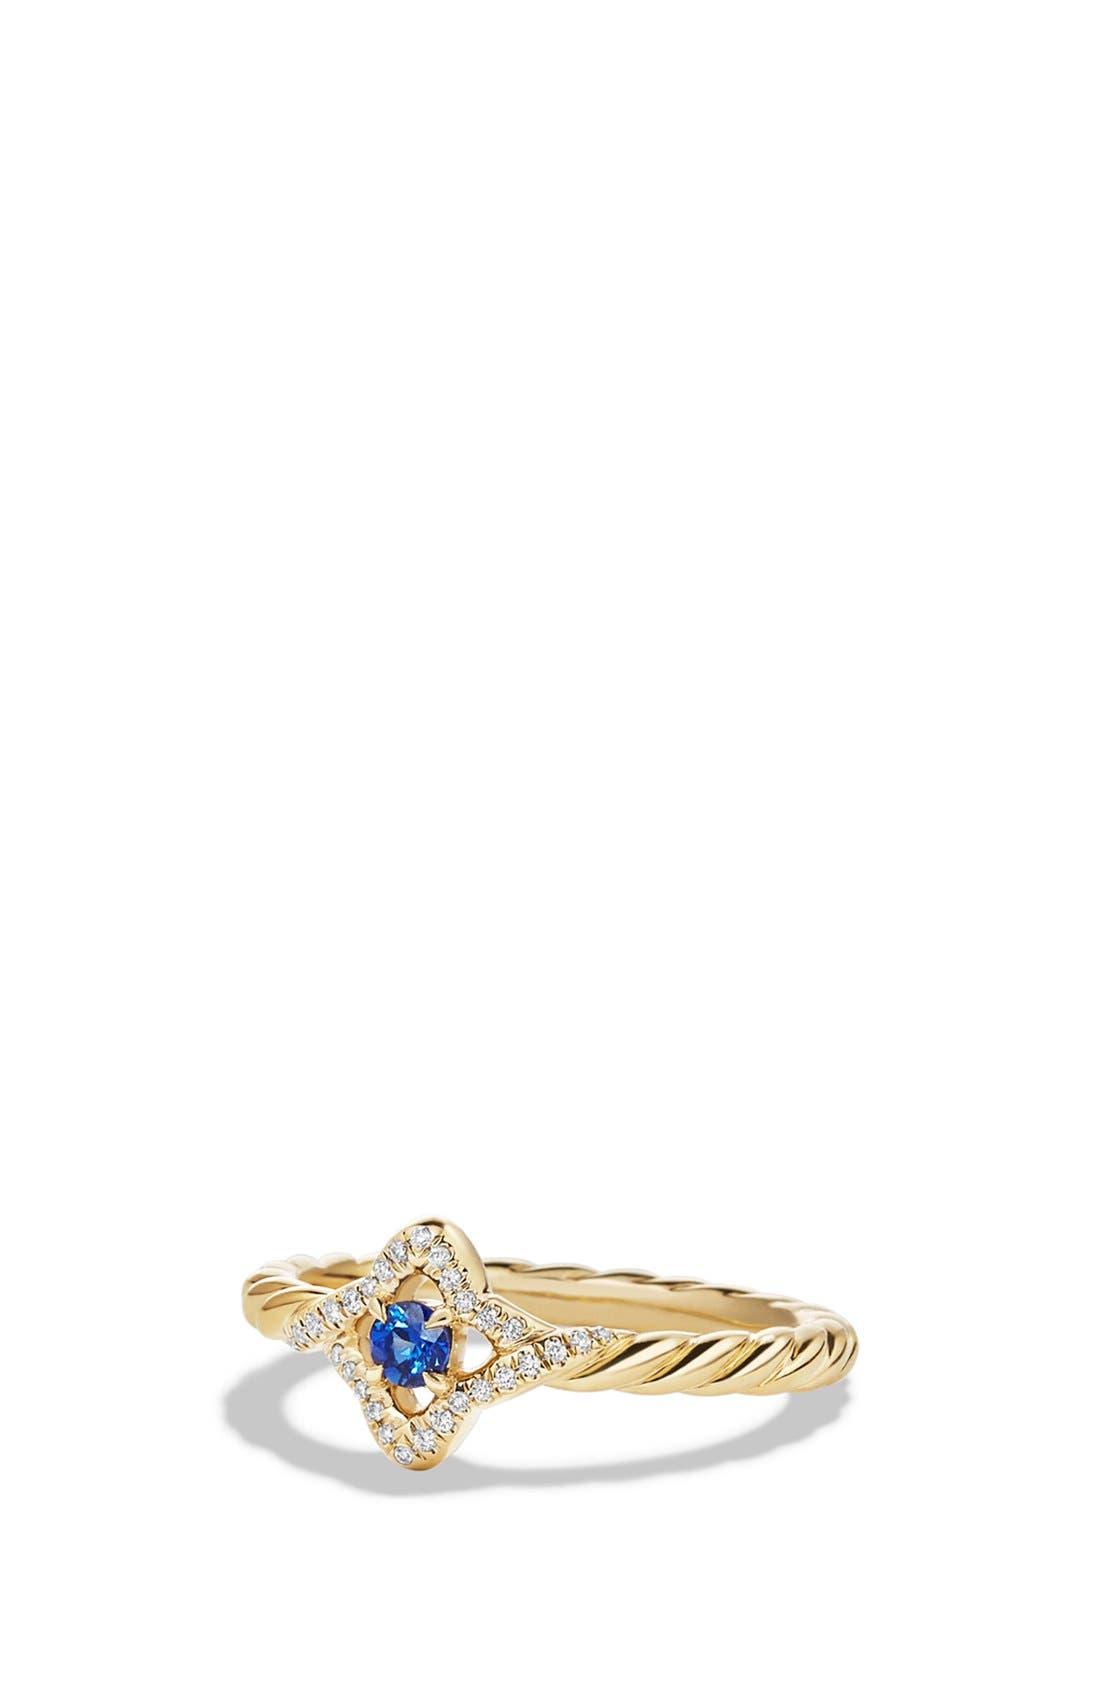 DAVID YURMAN Venetial Quatrefoil Ring in Gold